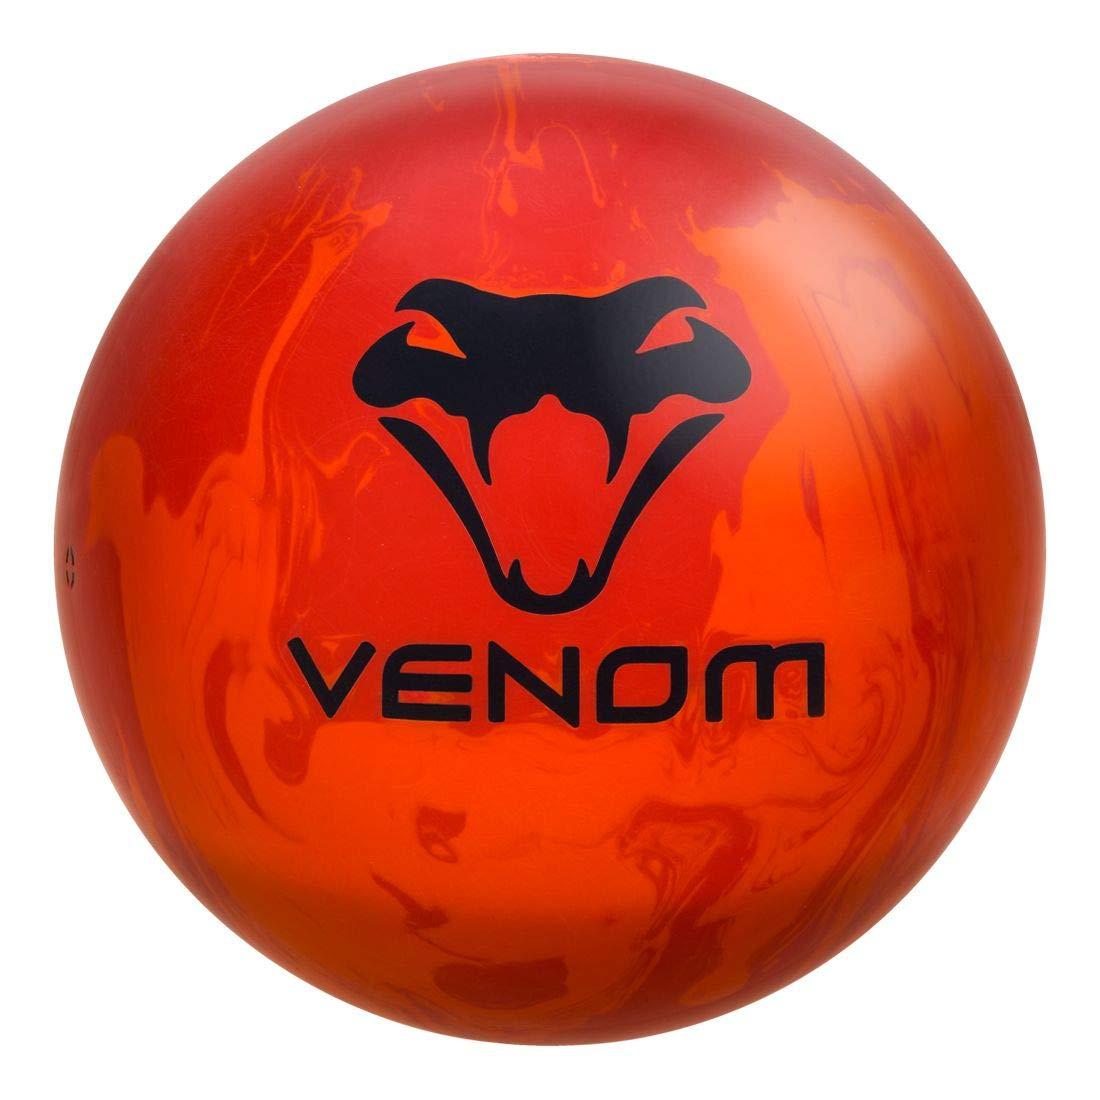 Motiv Venom Recoil Bowling Ball- 2-Tone Orange 13lbs